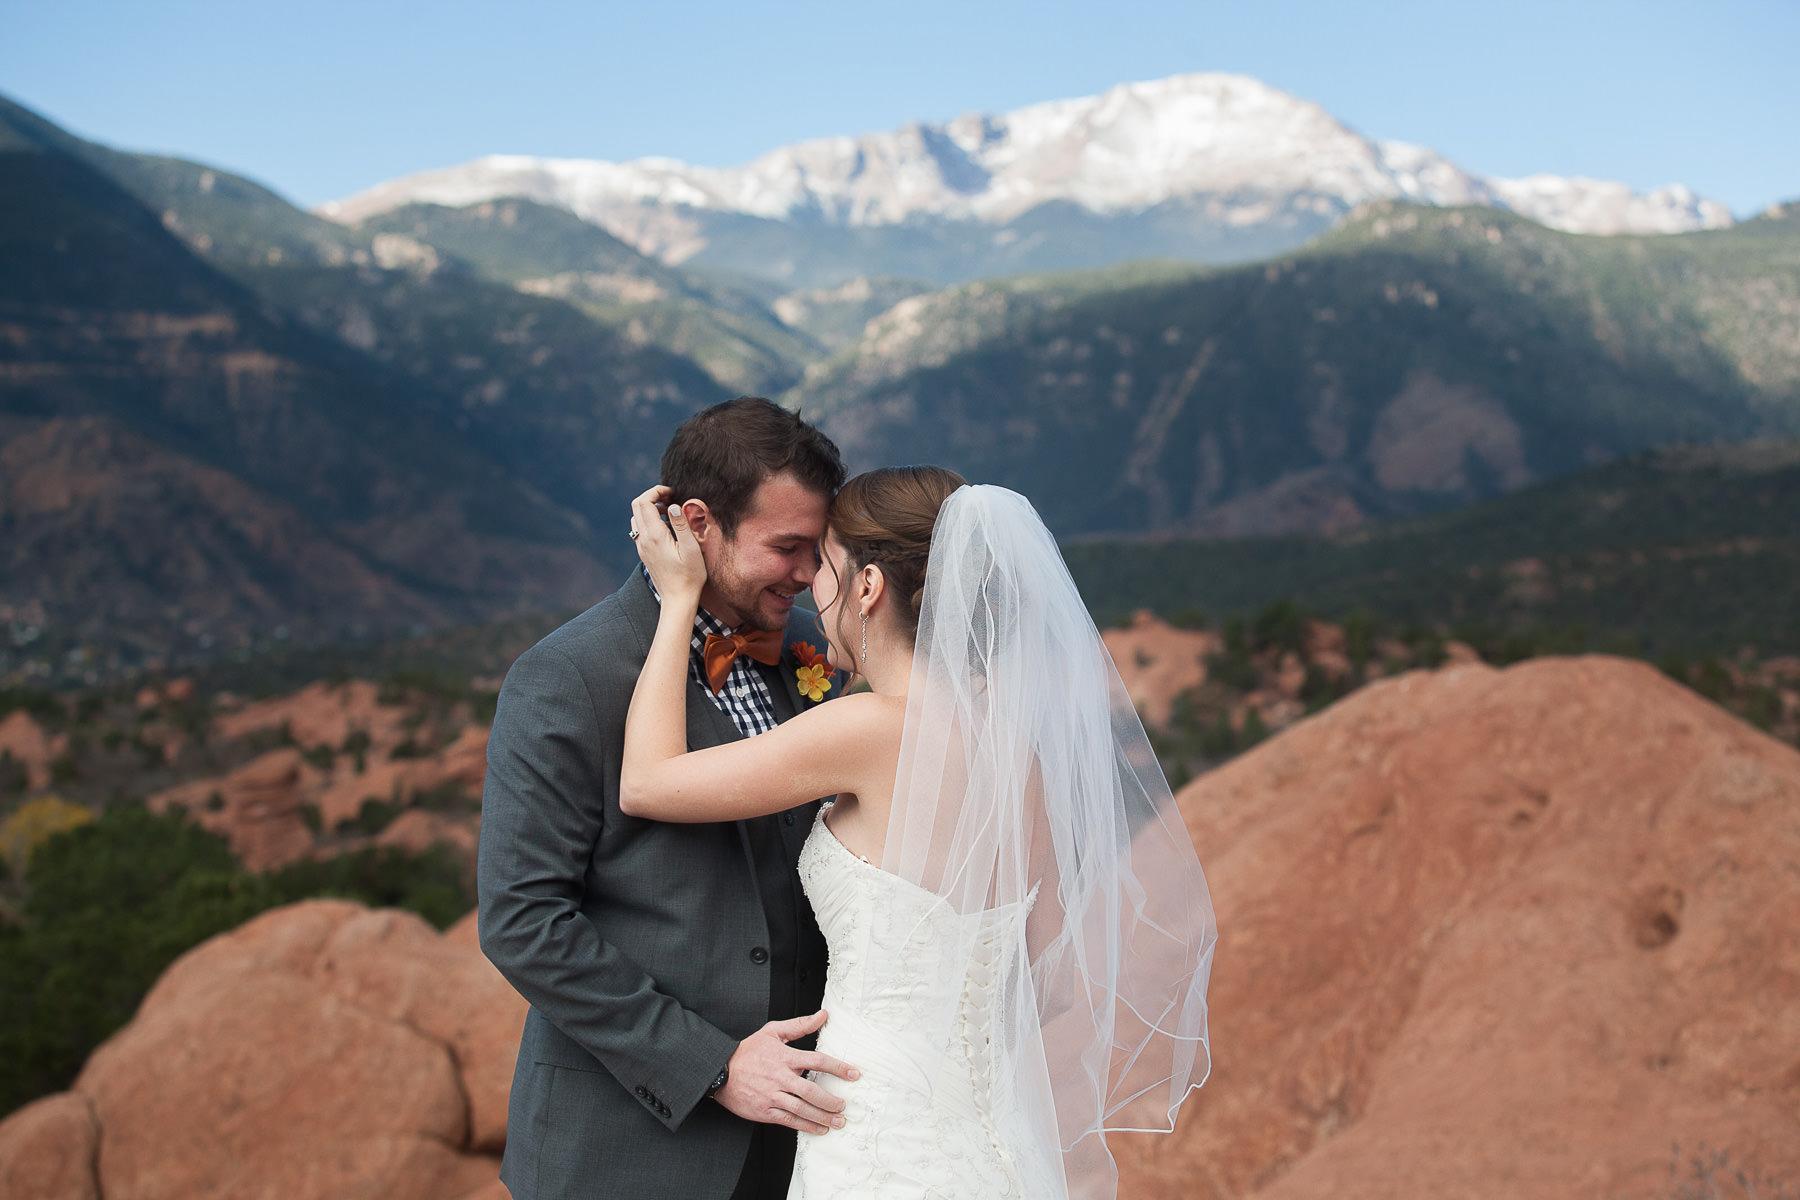 4-hour-Destination-Wedding